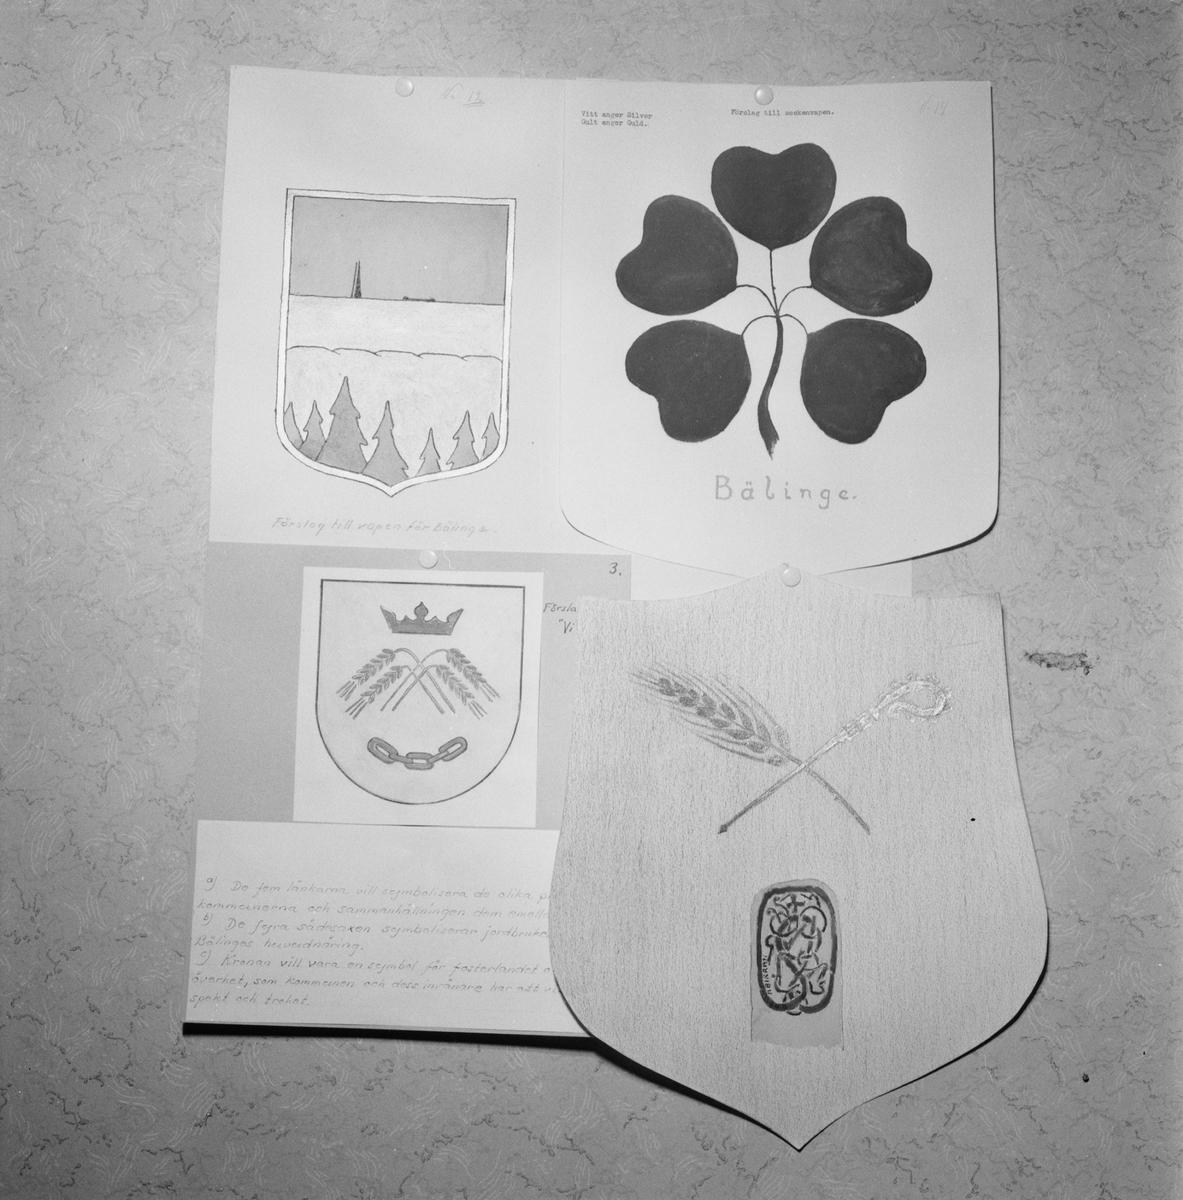 Bälinge storkommun, kommunvapen, Uppland, april 1952